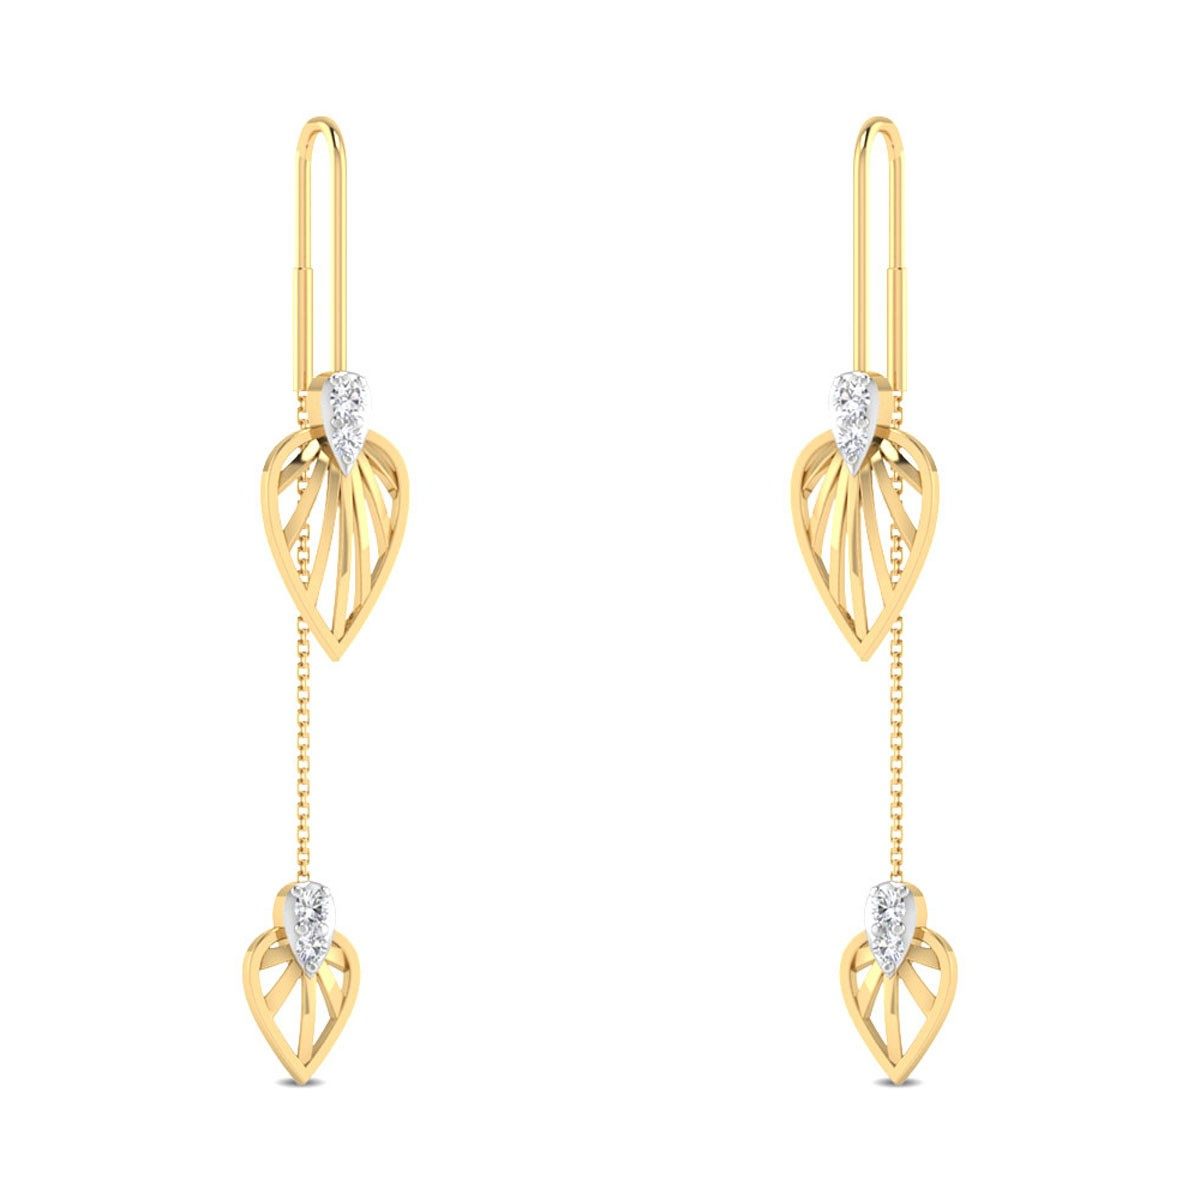 Janice Leafy Sui Dhaga Diamond Earrings